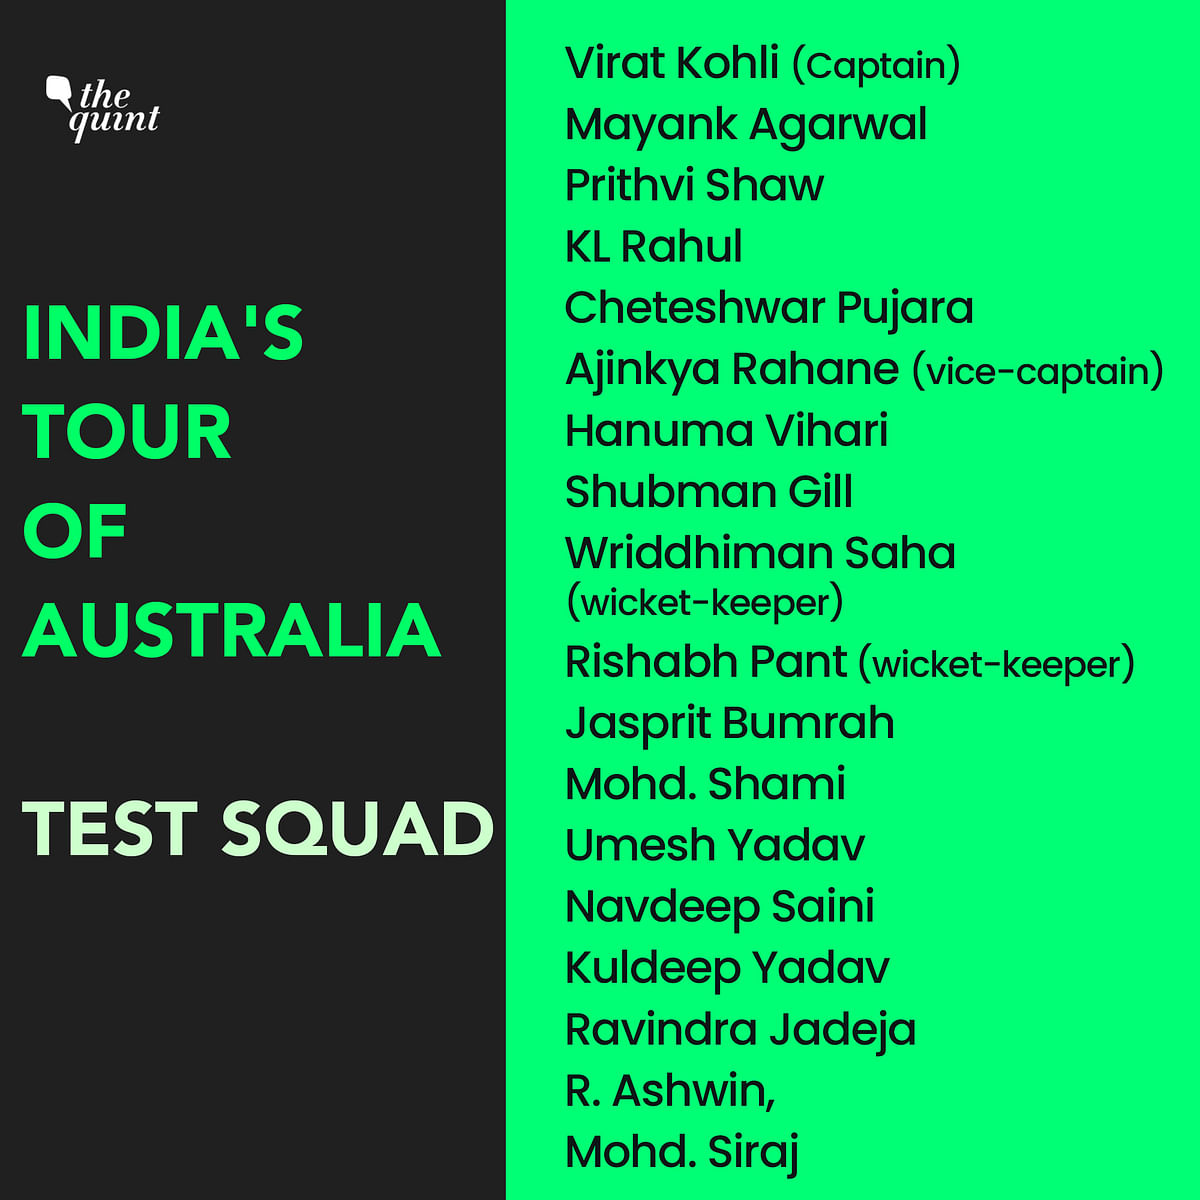 BCCI Announce India's T20, ODI & Test Squads for Tour of Australia